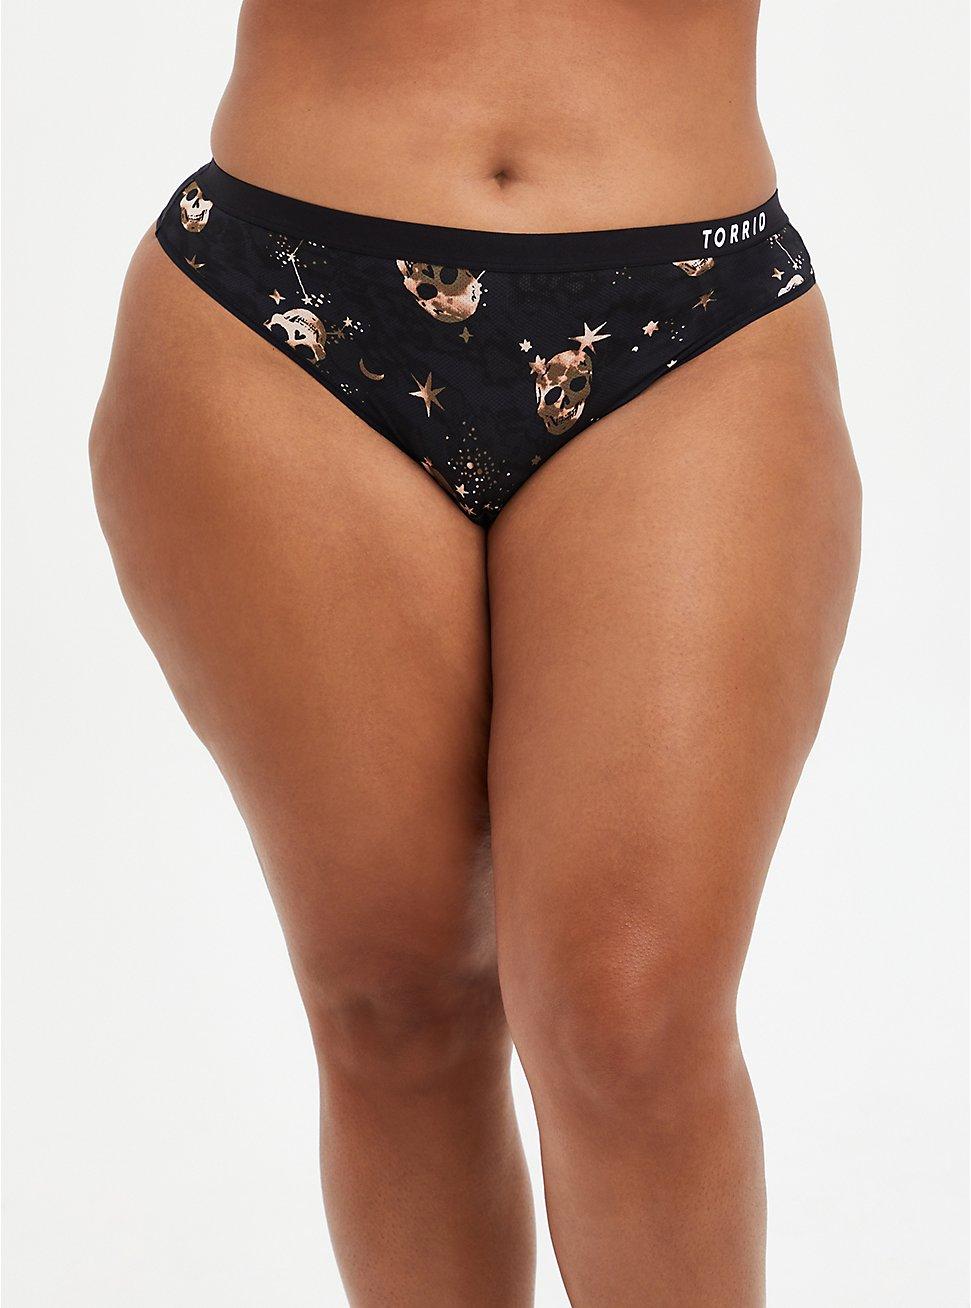 Active Thong Panty - Microfiber Skulls Black, STARRY SKULL, hi-res